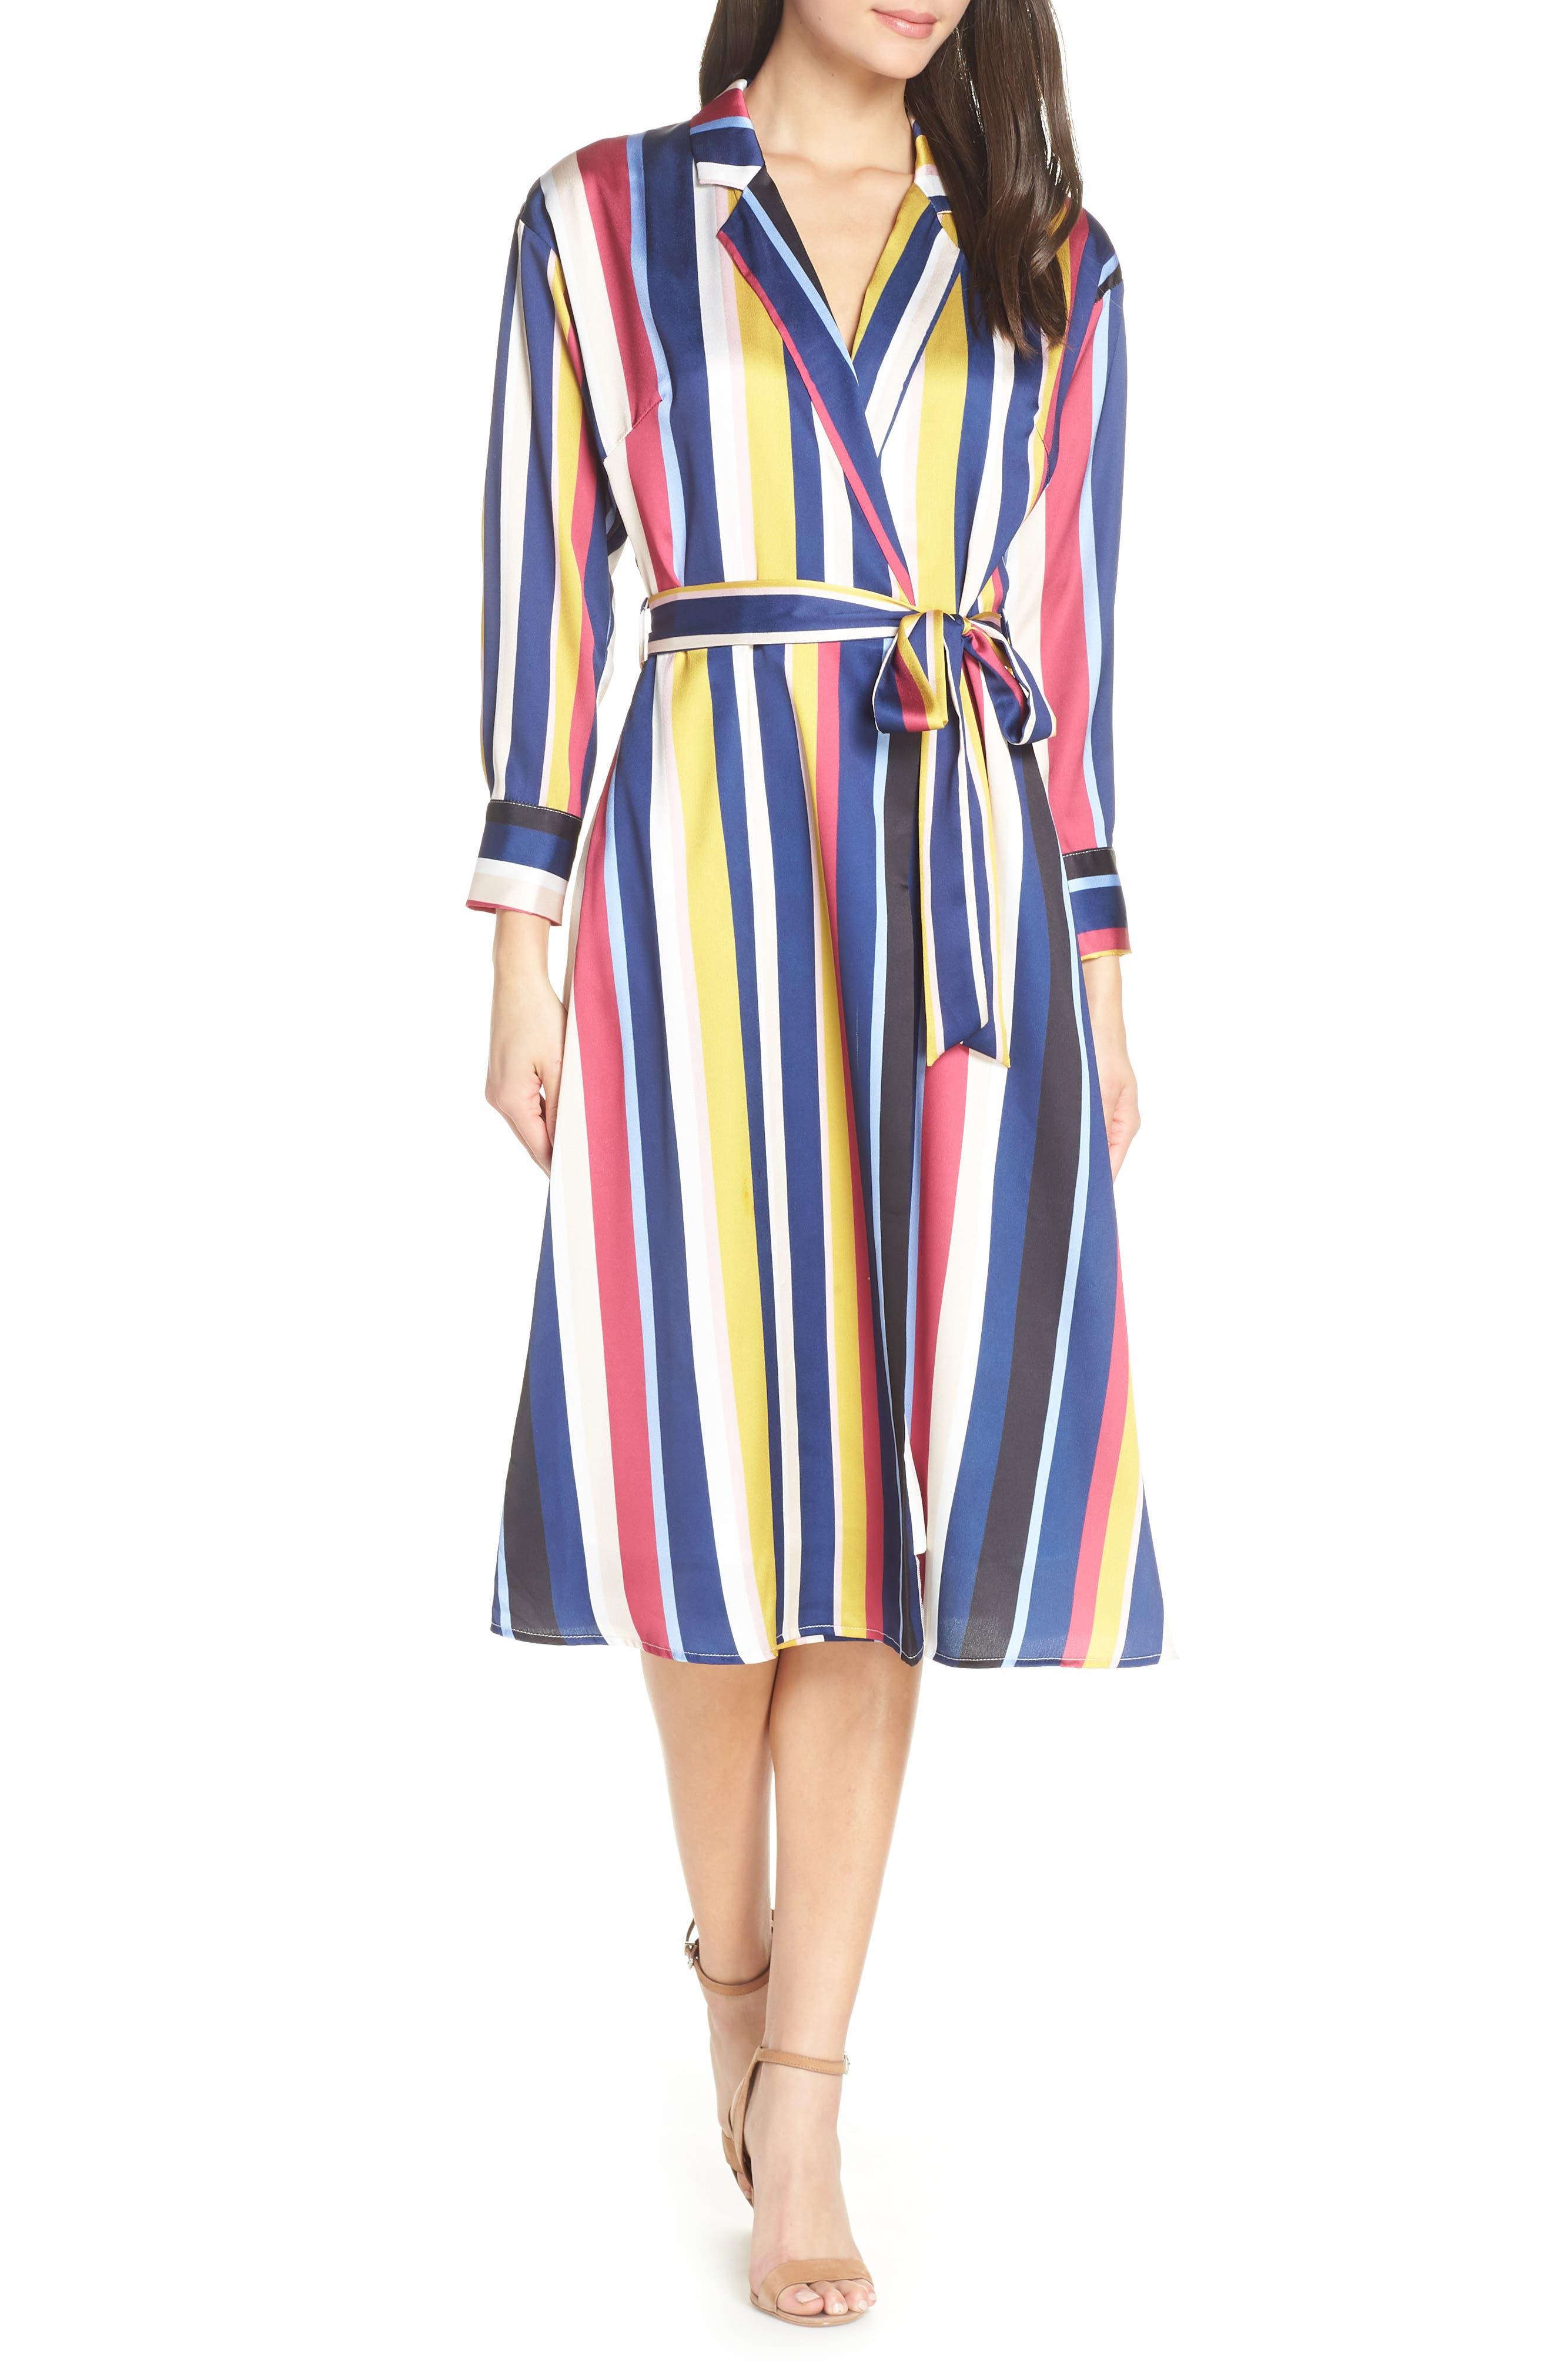 70s Dresses – Disco Dresses, Hippie Dresses, Wrap Dresses Womens Chelsea28 Stripe Shirtdress $129.00 AT vintagedancer.com